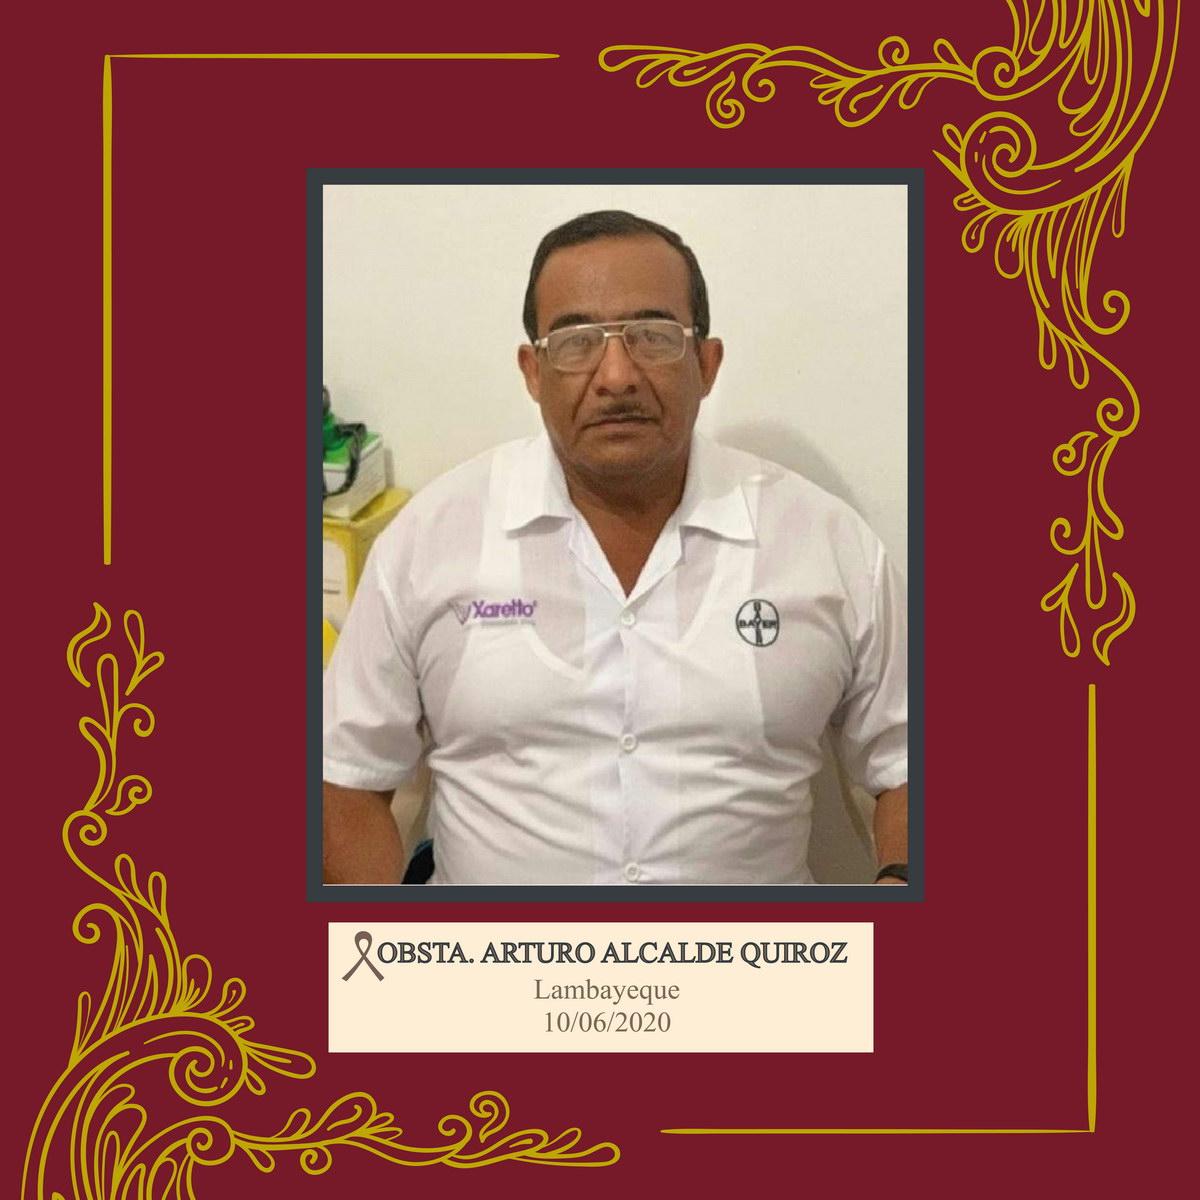 Arturo Alcalde Quiroz